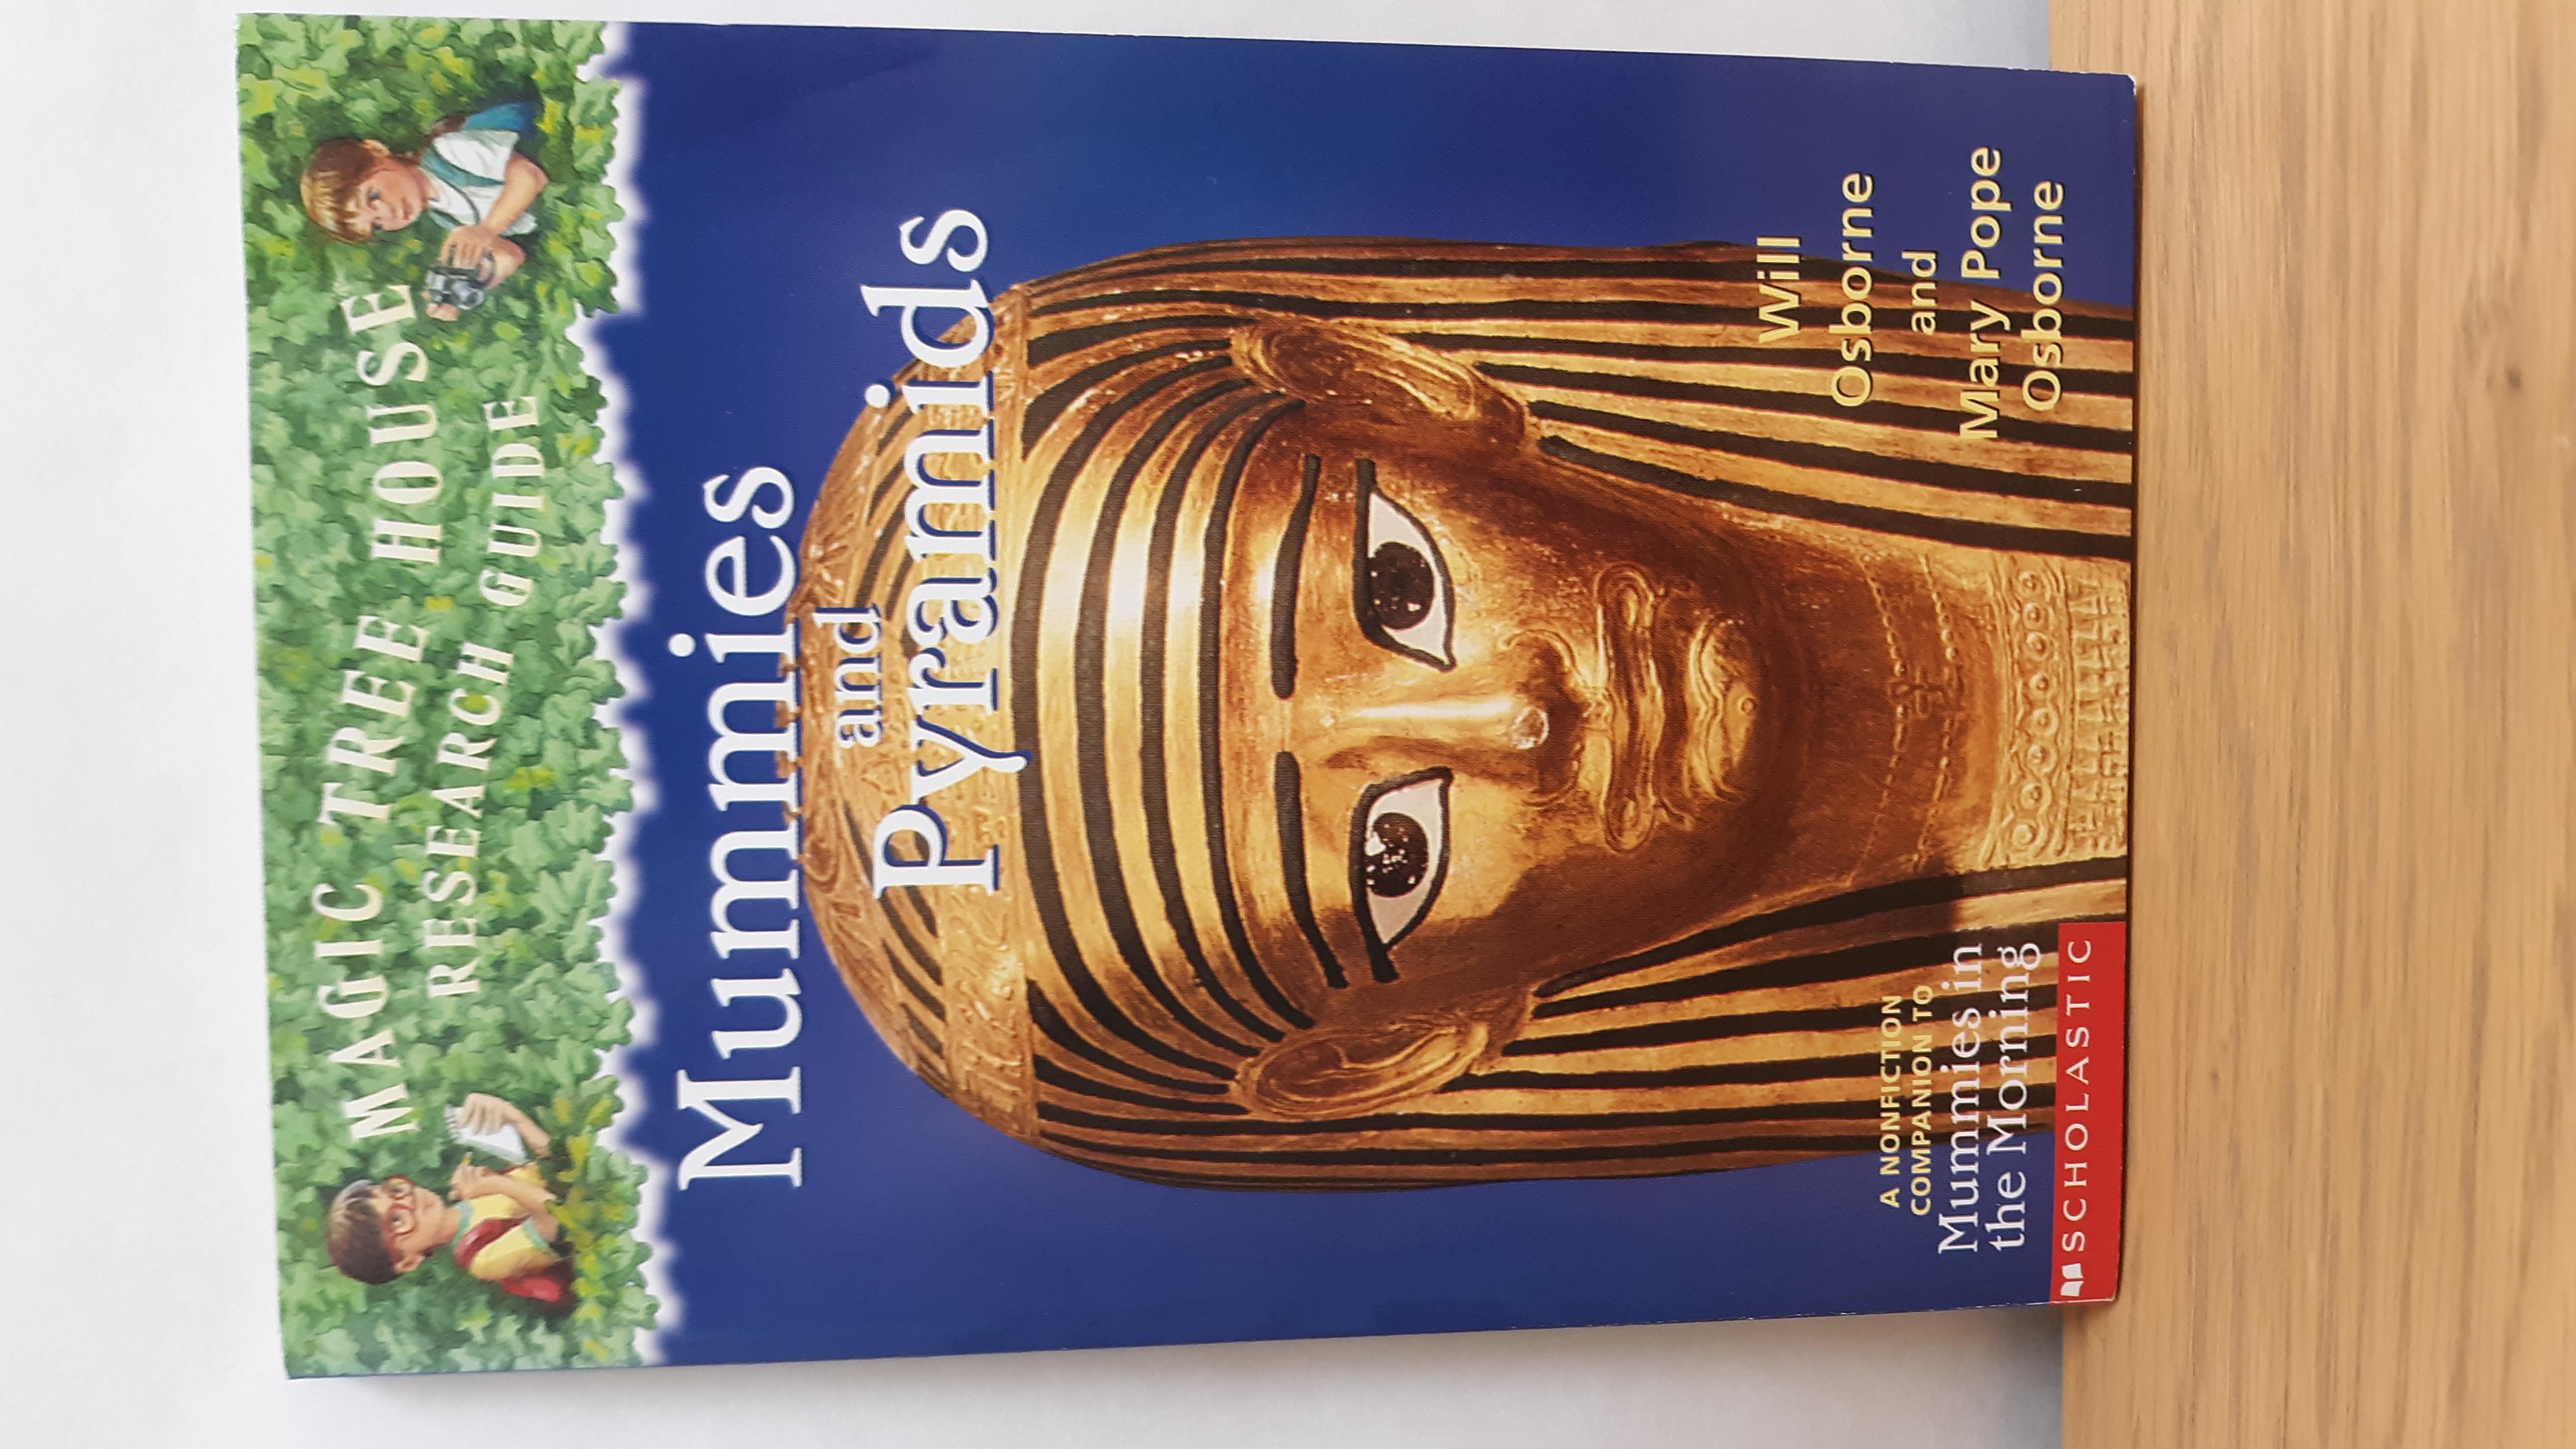 https://0201.nccdn.net/1_2/000/000/0a5/734/magic-tree-house-research-guide-mummies-and-pyramids.jpg